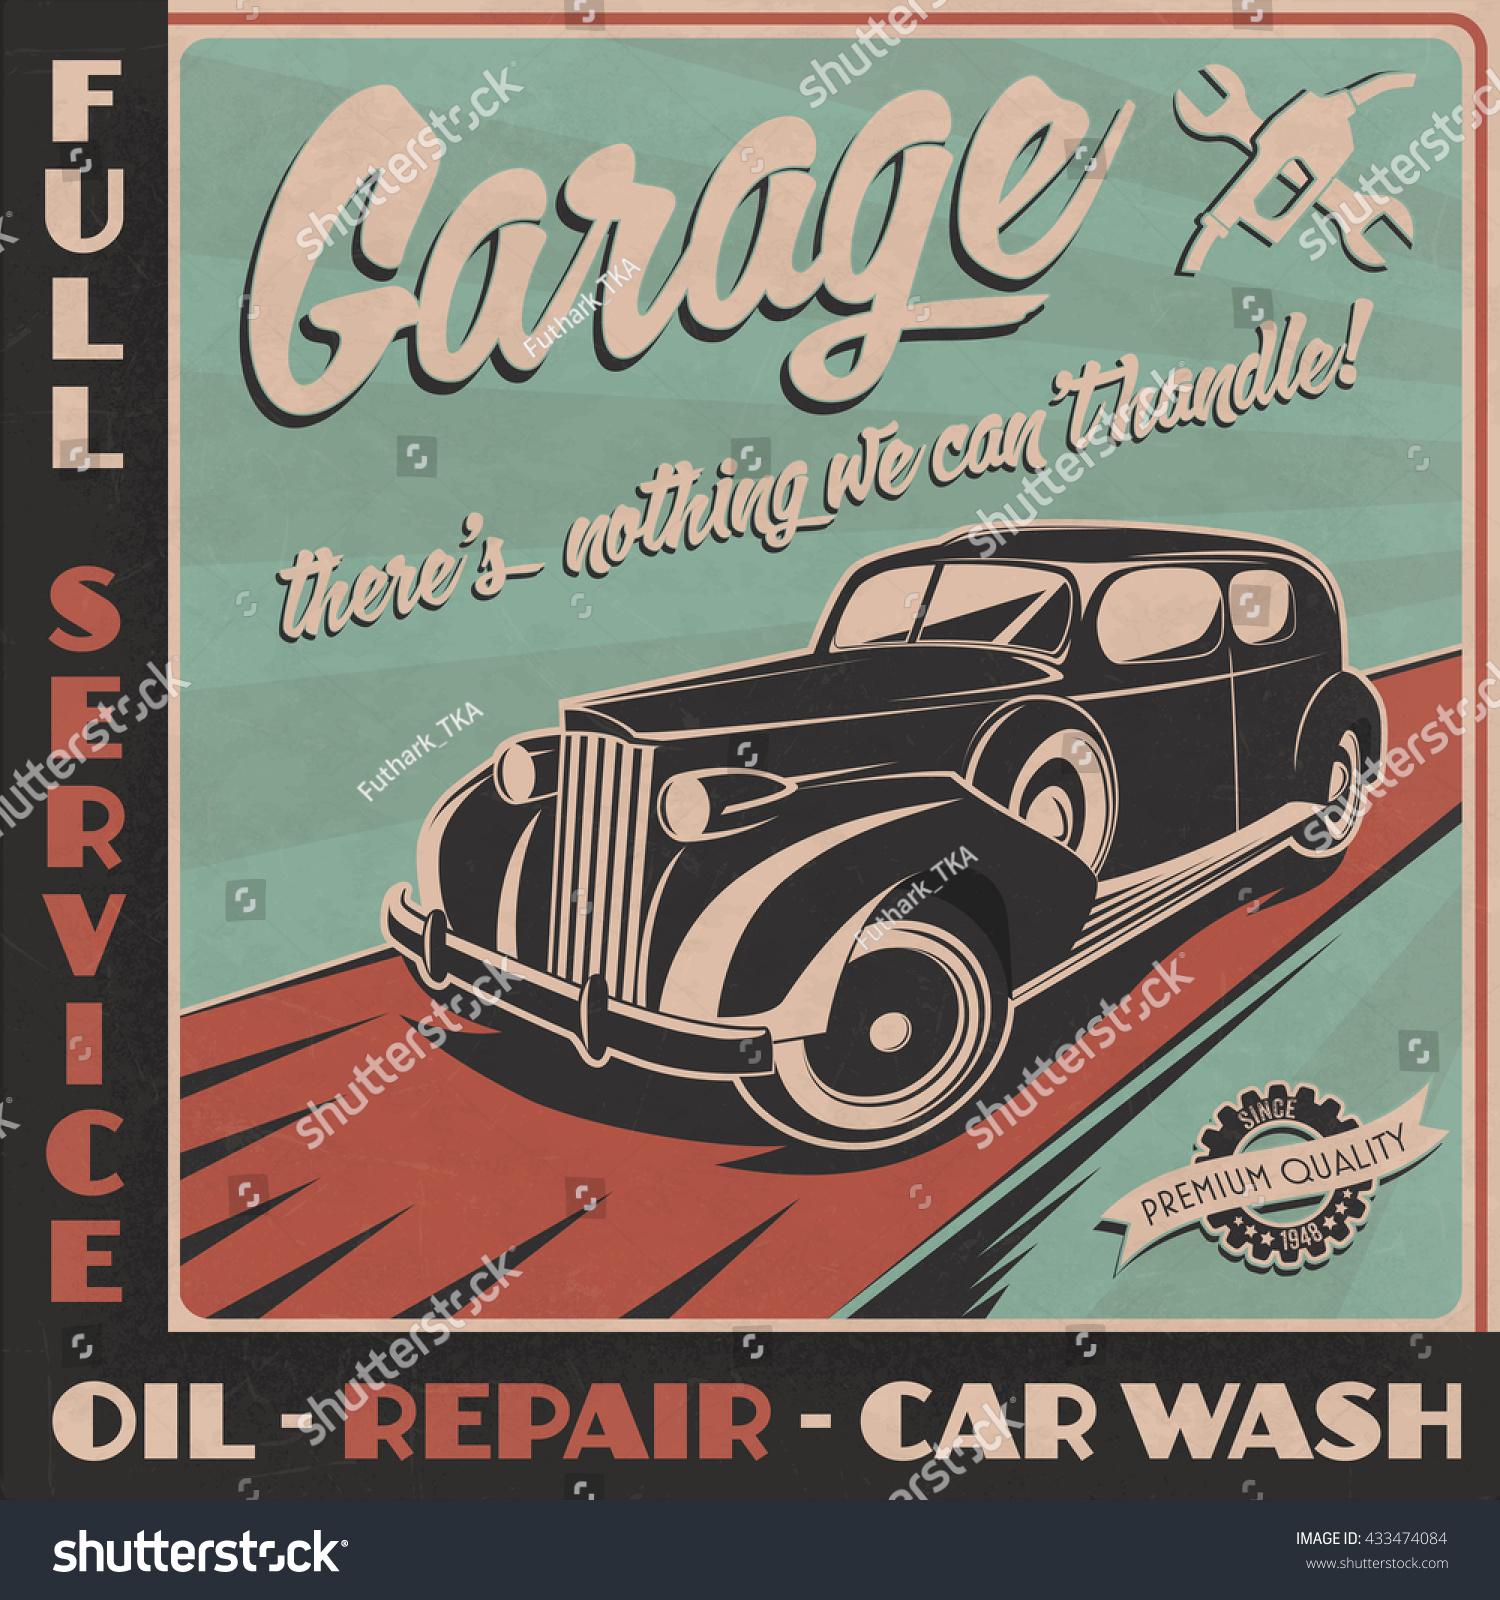 Vintage Automotive Signs For Garage : Garage sign retro style vintage car stock vector